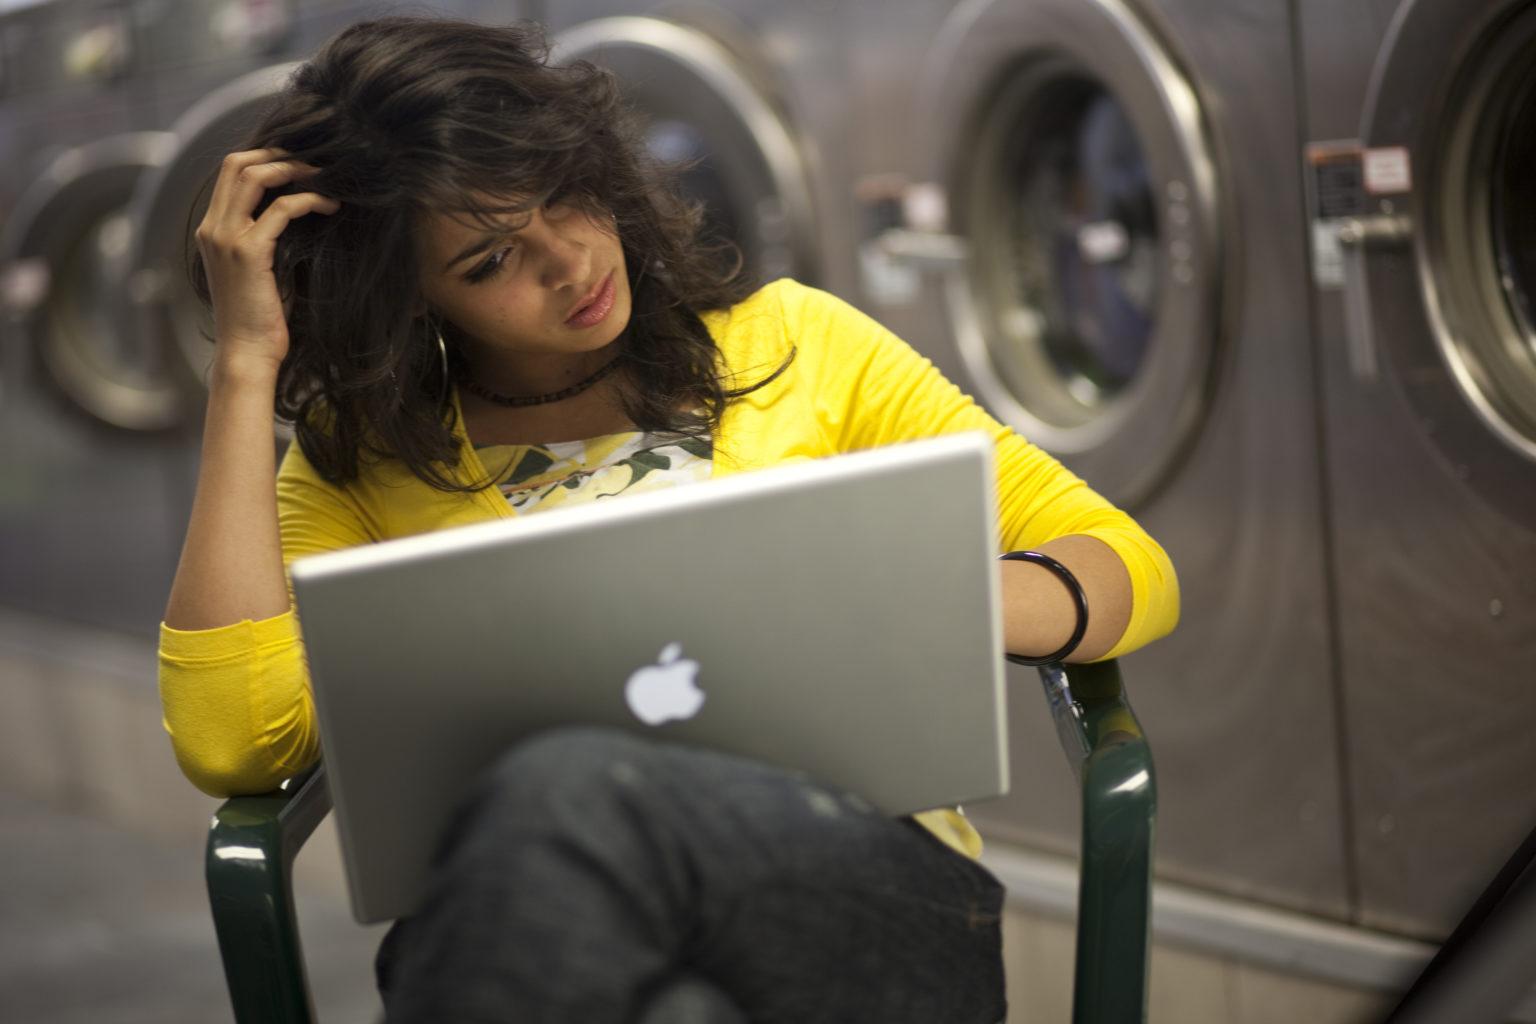 Girl working on laptop at laundrymat